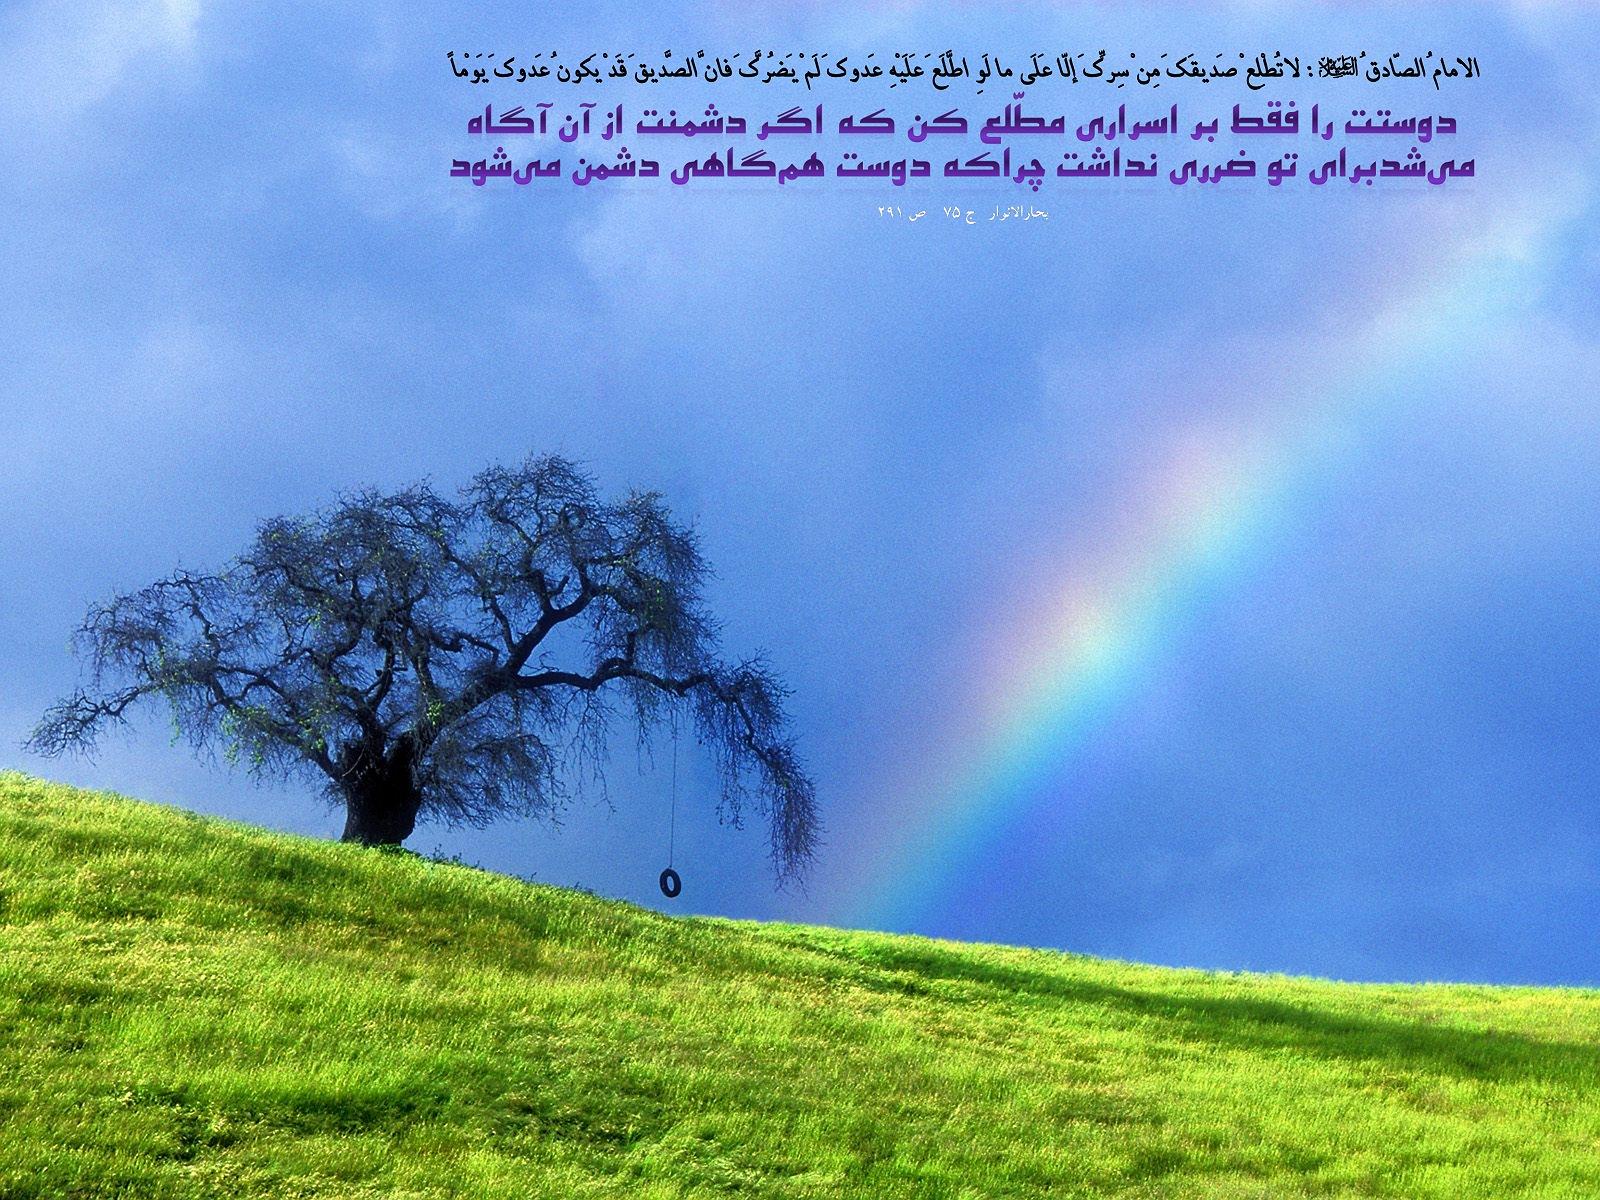 8j0c_810_hadis_010.jpg